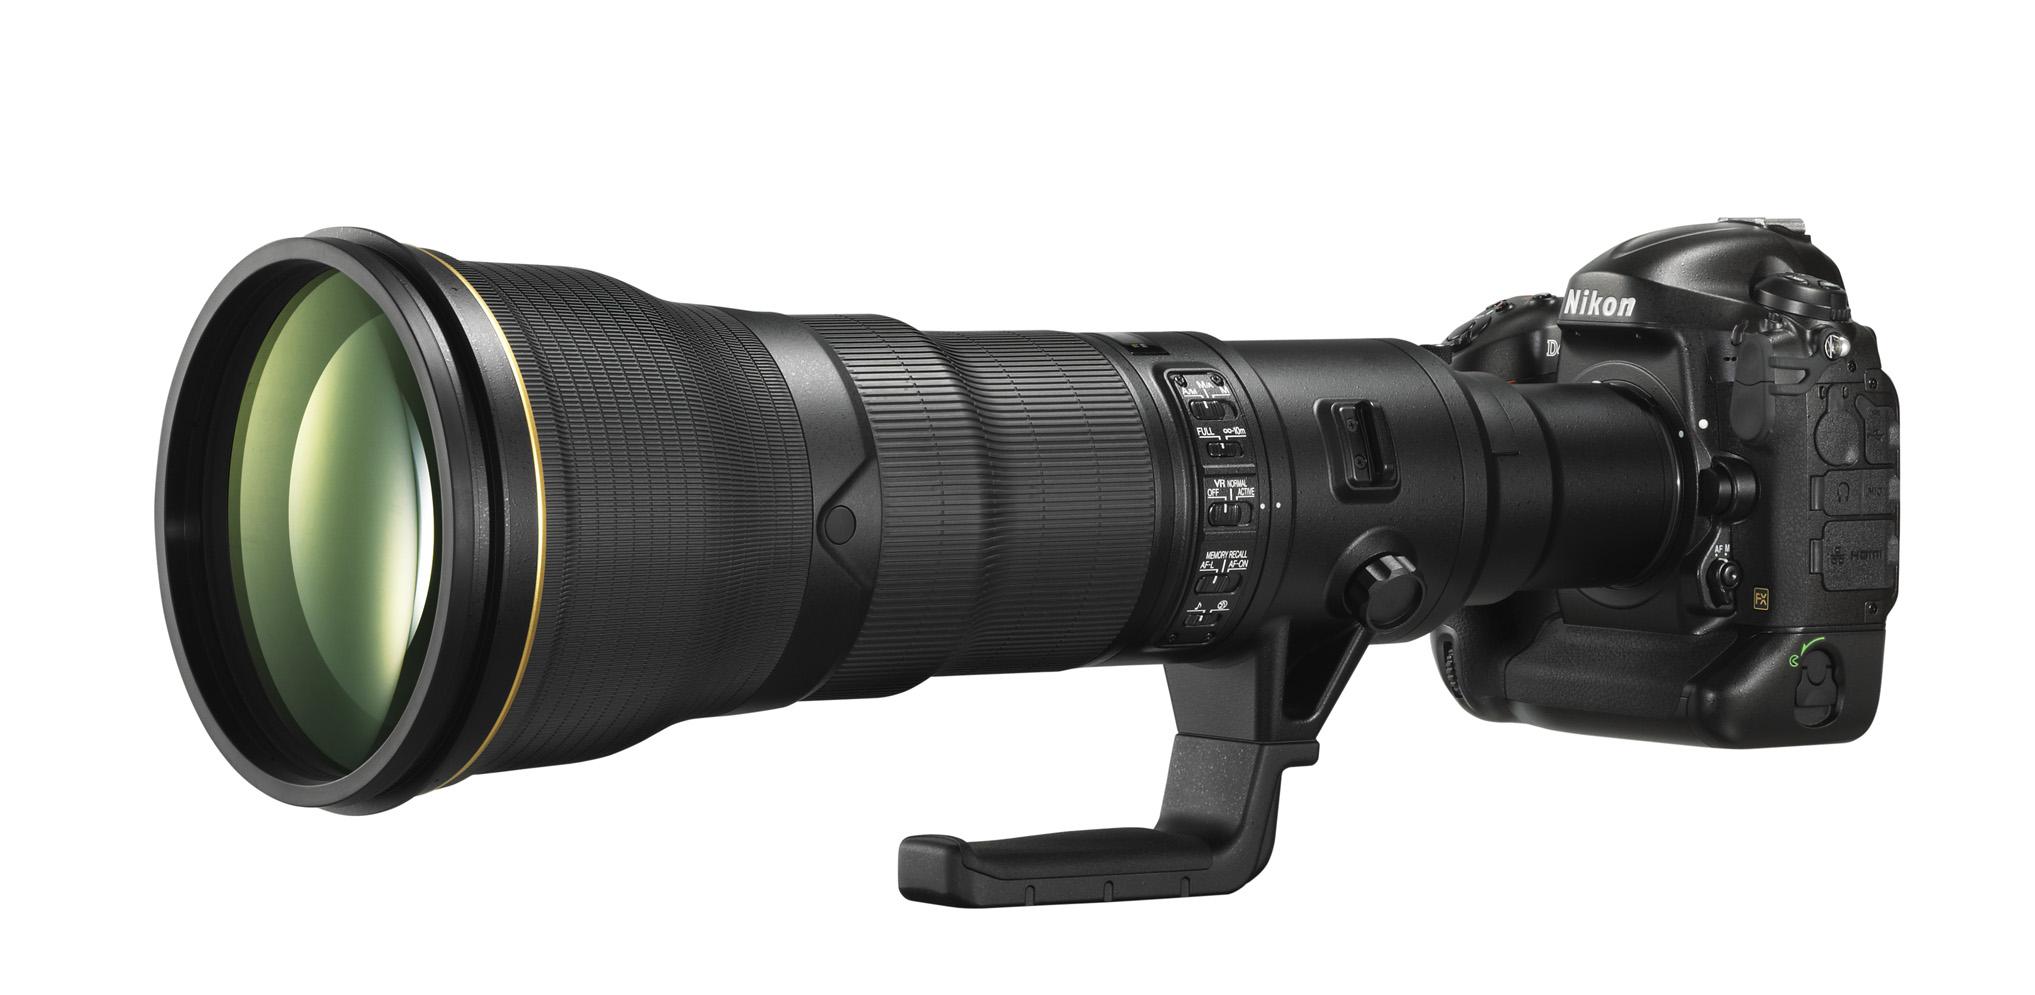 Nikon announces development of 800mm F5 6 VR super-telephoto lens